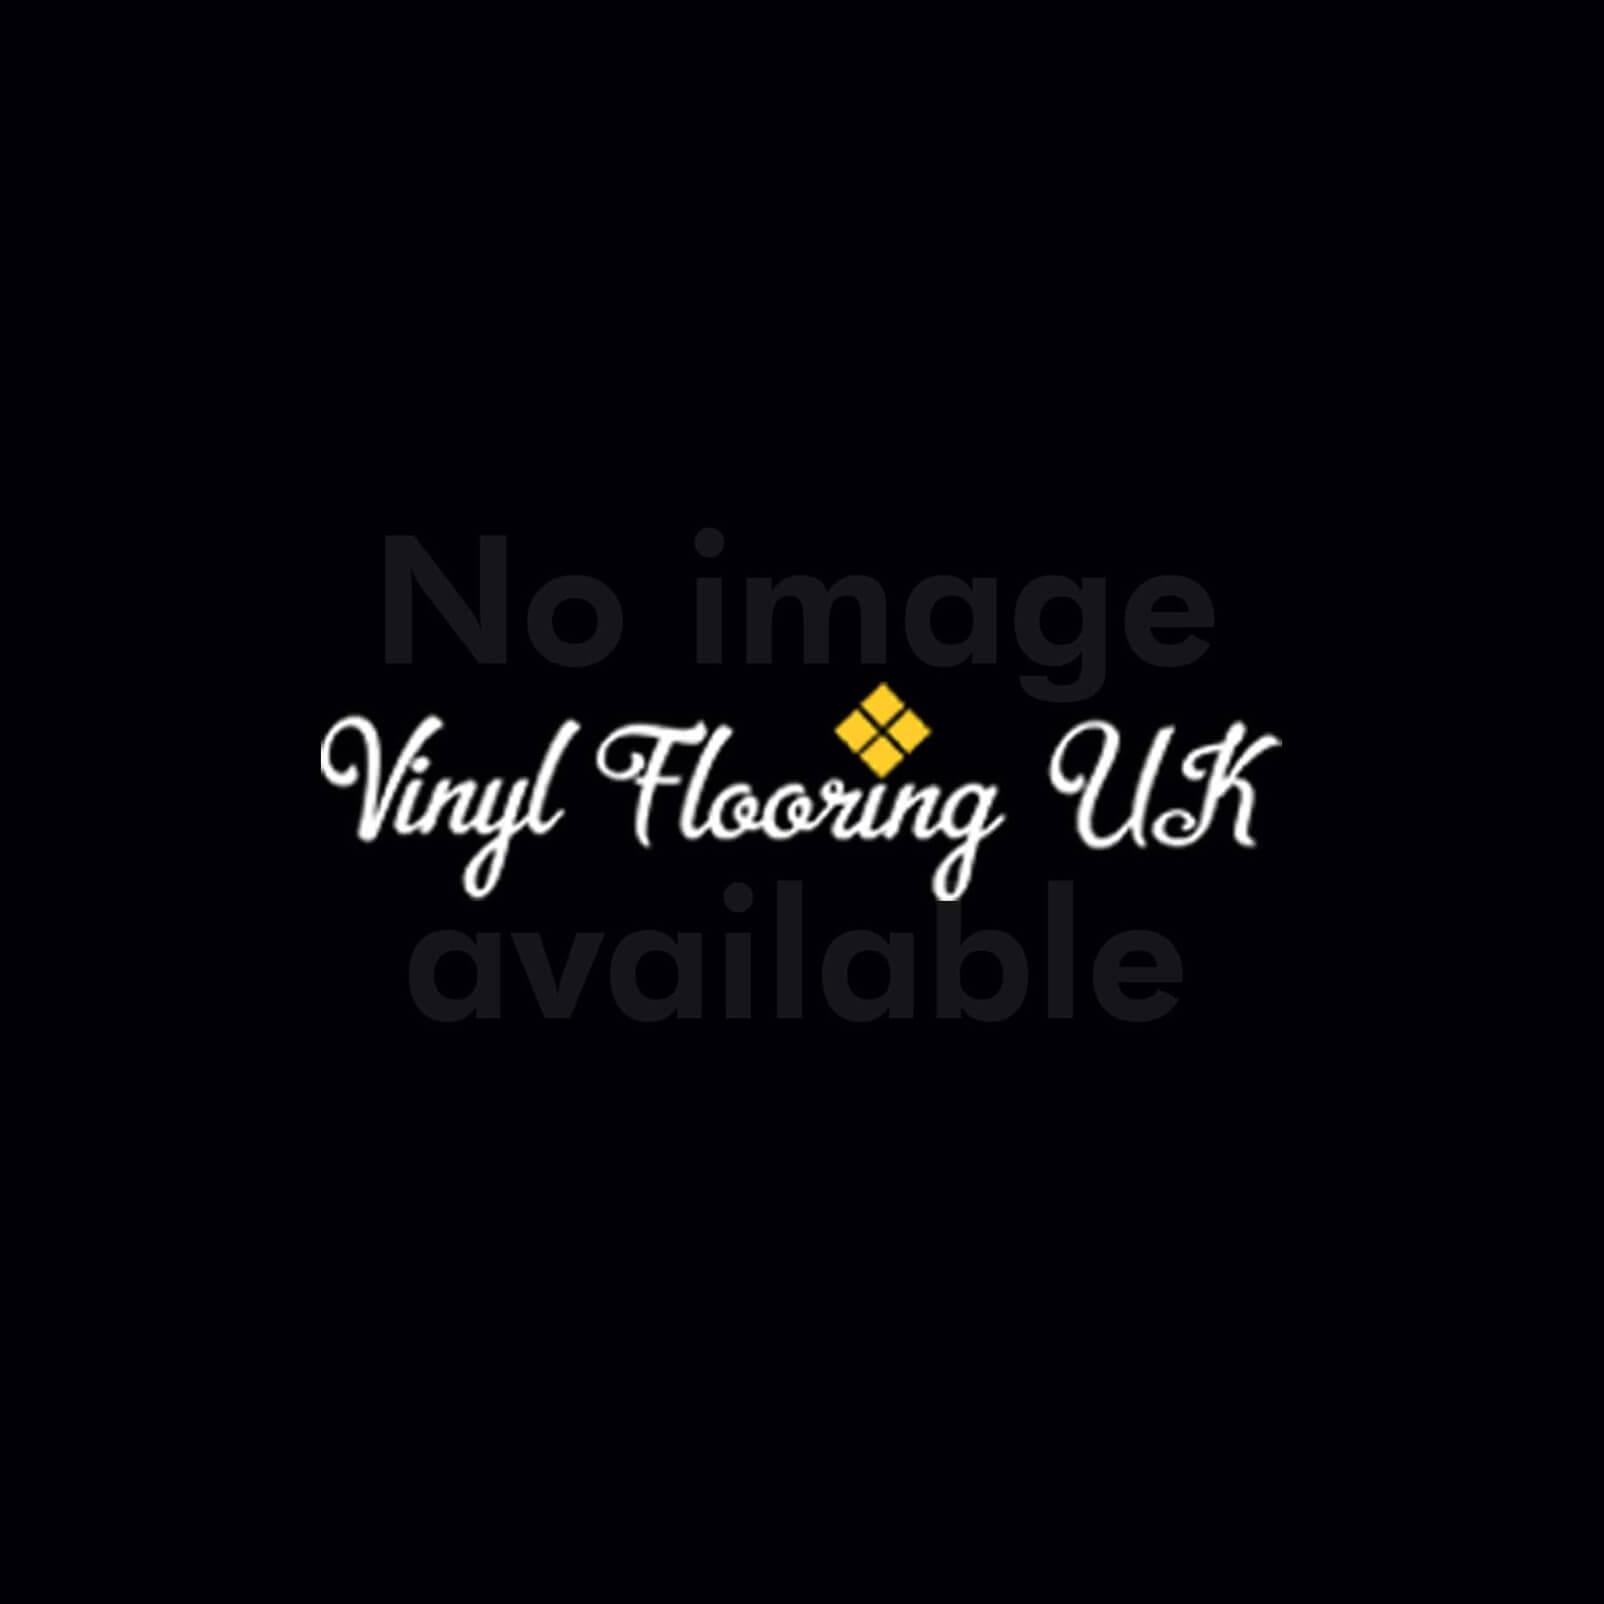 Lifestyle BaroqueAMADORA 990 Vinyl Flooring